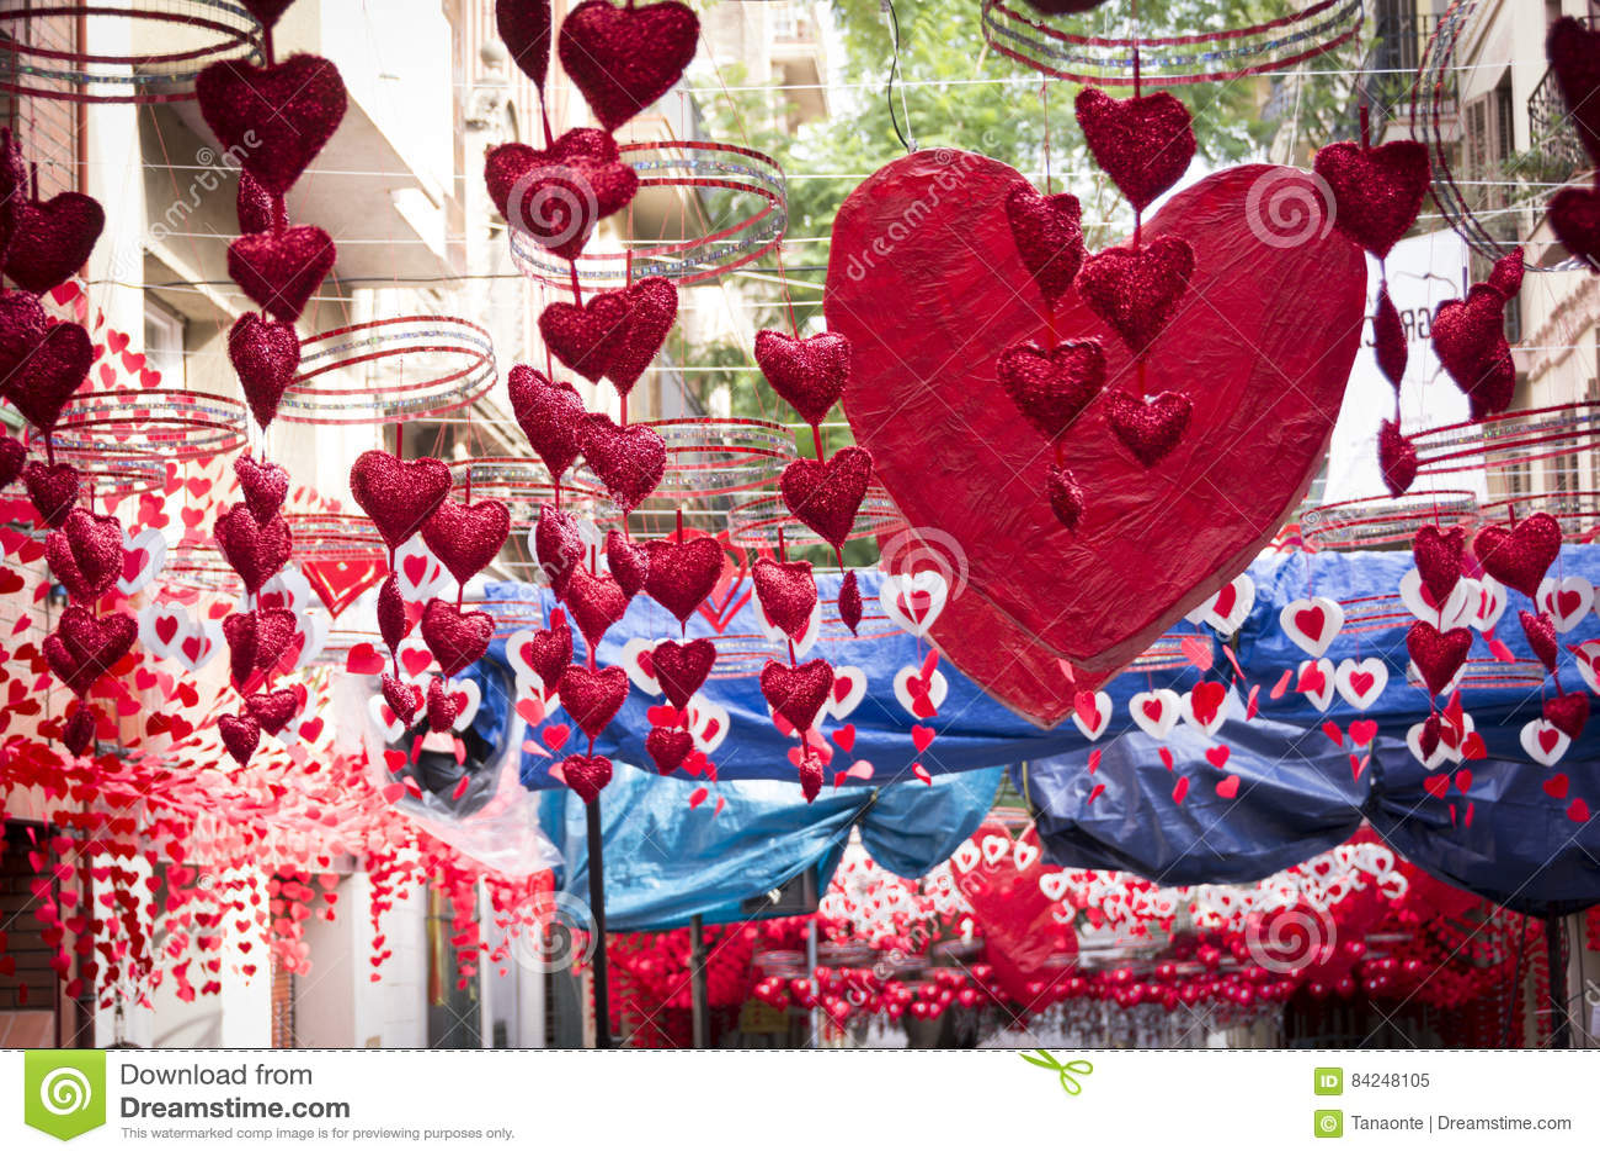 Rote Herzen, die in Gracia-Bezirk, Barcelona hängen und sich bewegen